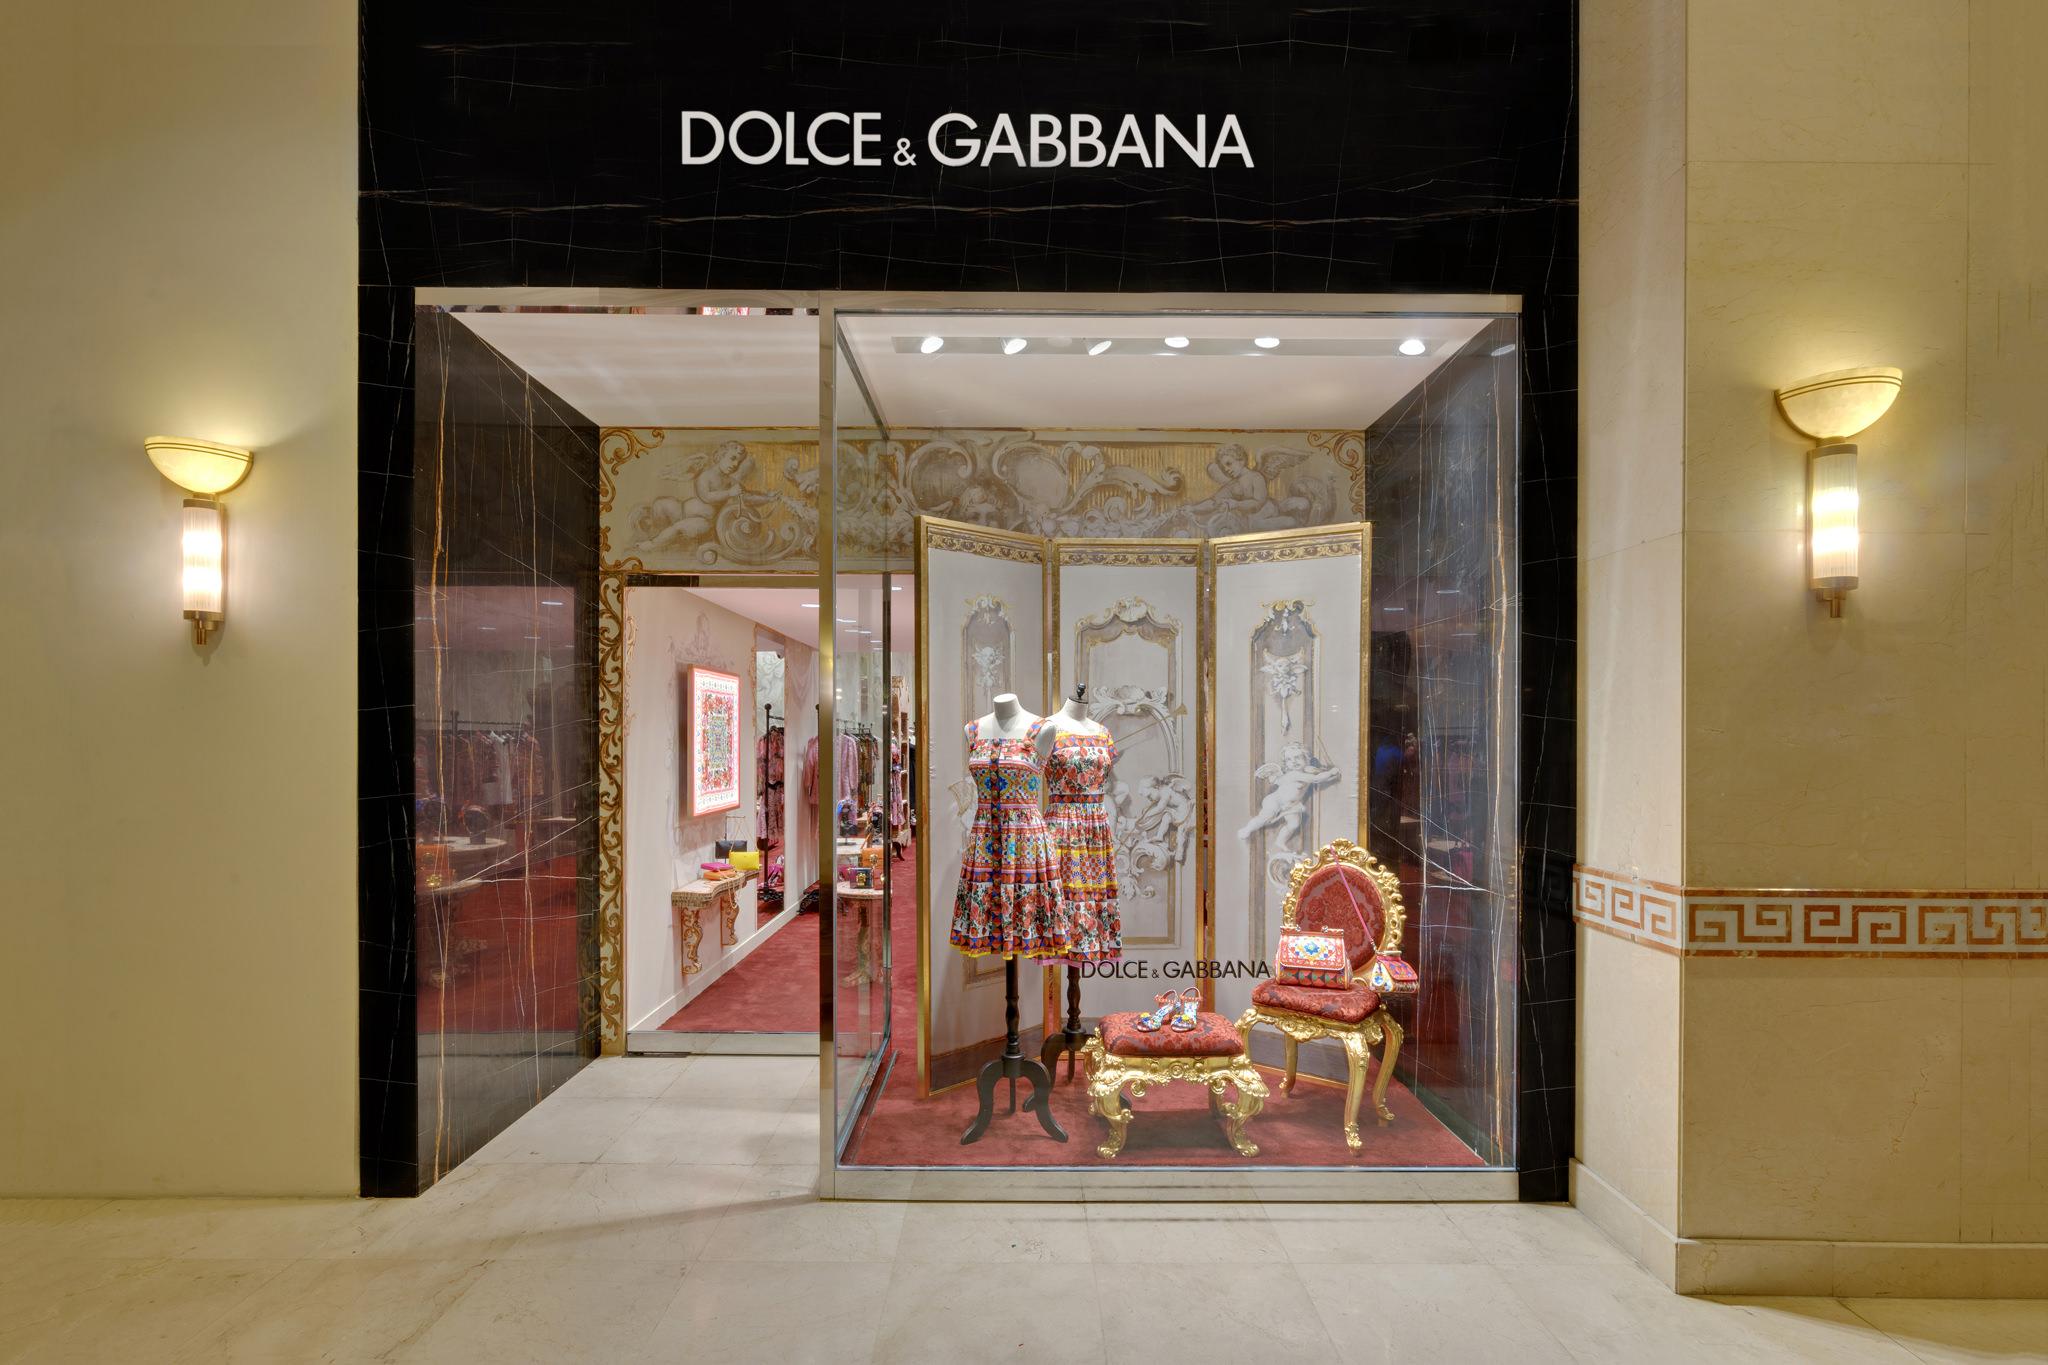 20170123 - Dolce & Gabbana - HCM - Commercial - Interior - Store - Retouch 0013.jpg